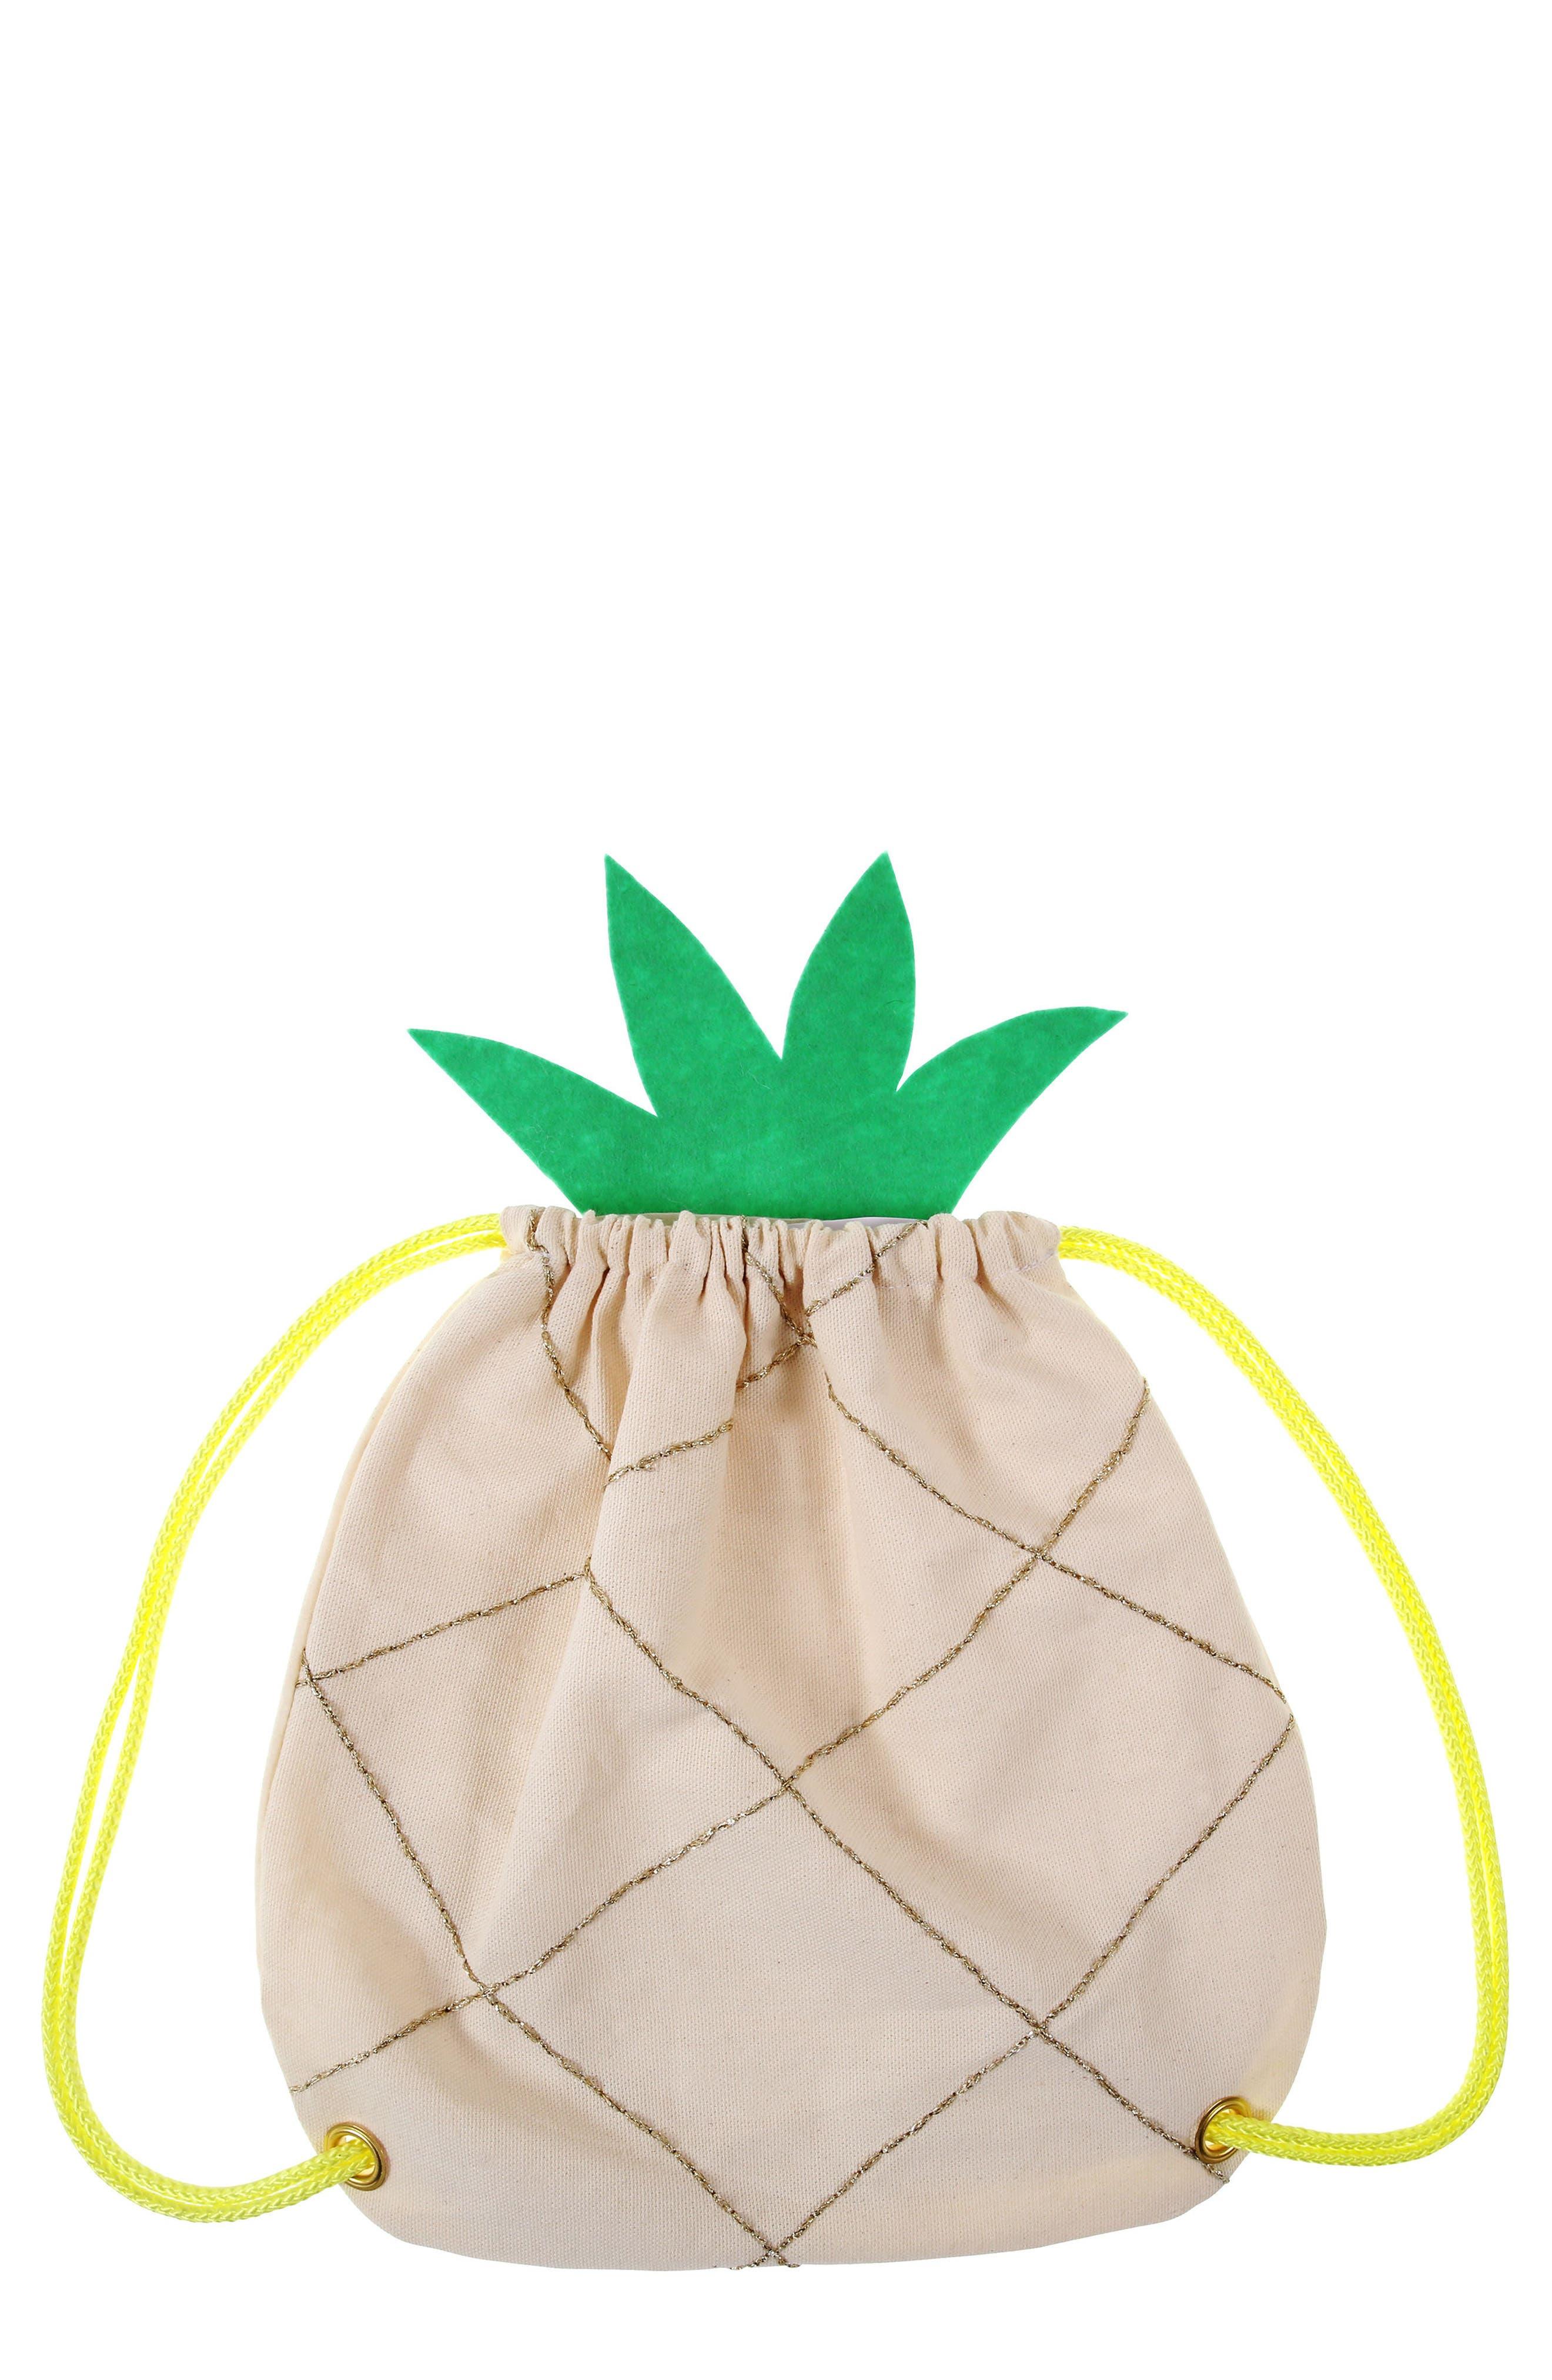 Backback Drawstring Bag,                         Main,                         color, Tan